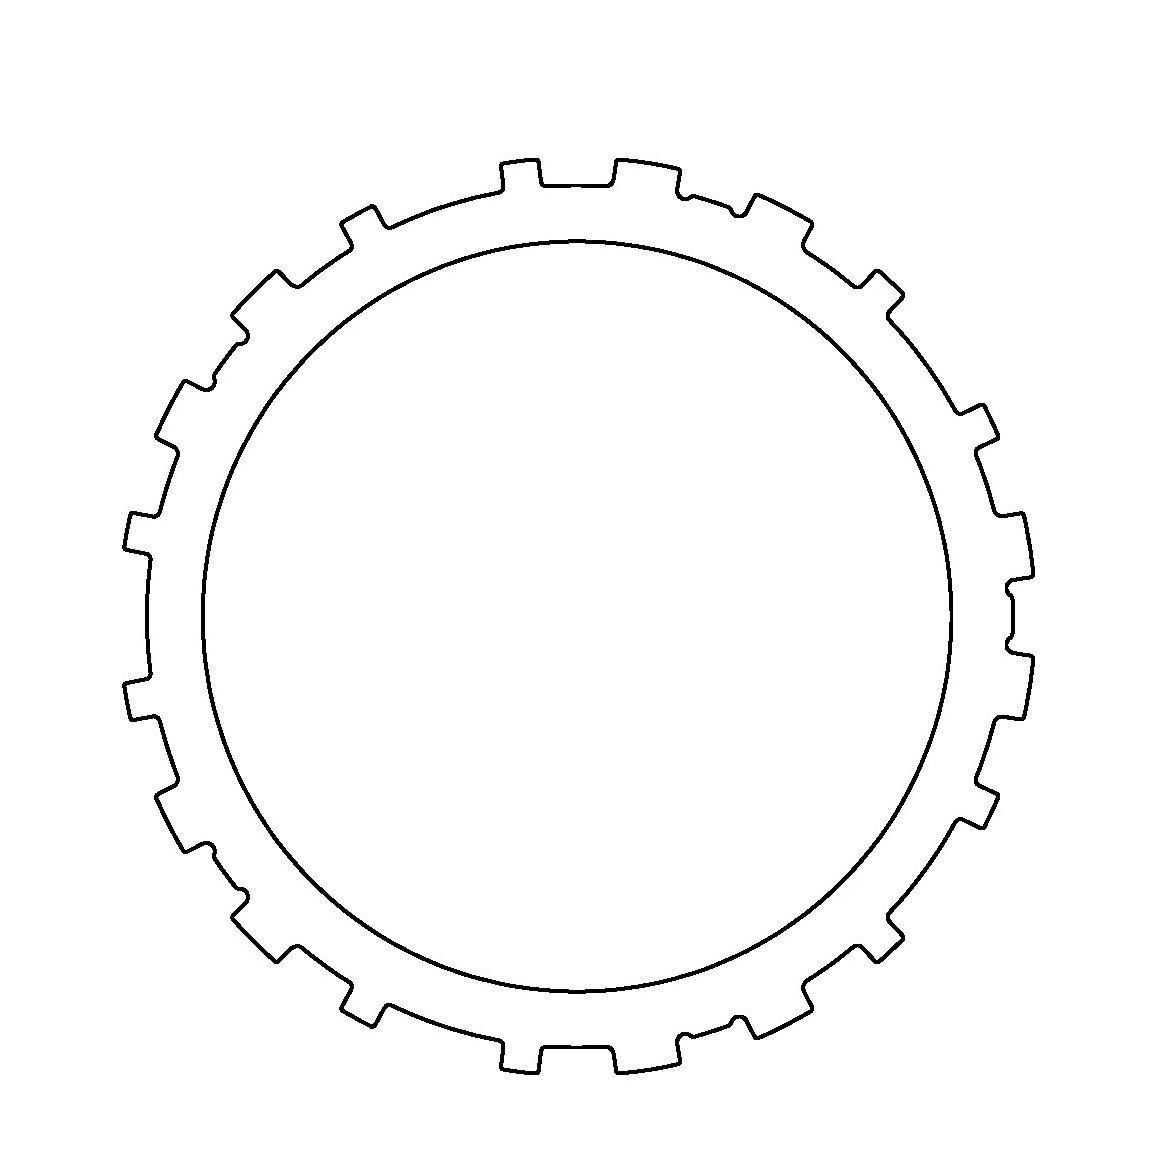 Aftermarket 057725A242 Steel, 3-4 Clutch (.095') 3-4 Clutch (.095) Transmaxx